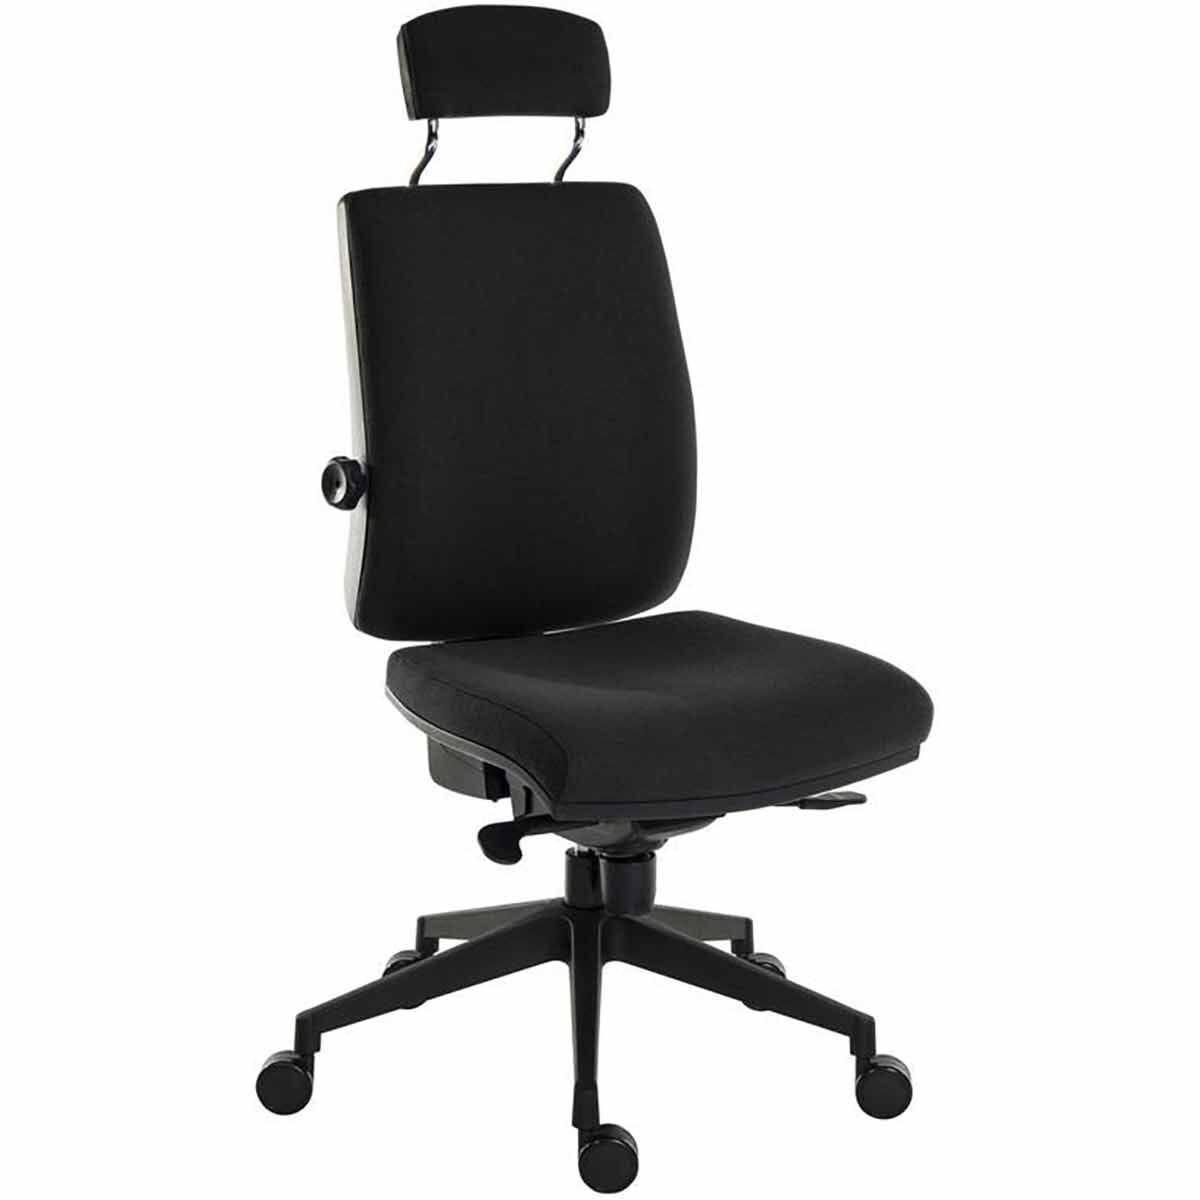 Teknik Office Ergo Plus Ultra Fabric Chair with Headrest Black